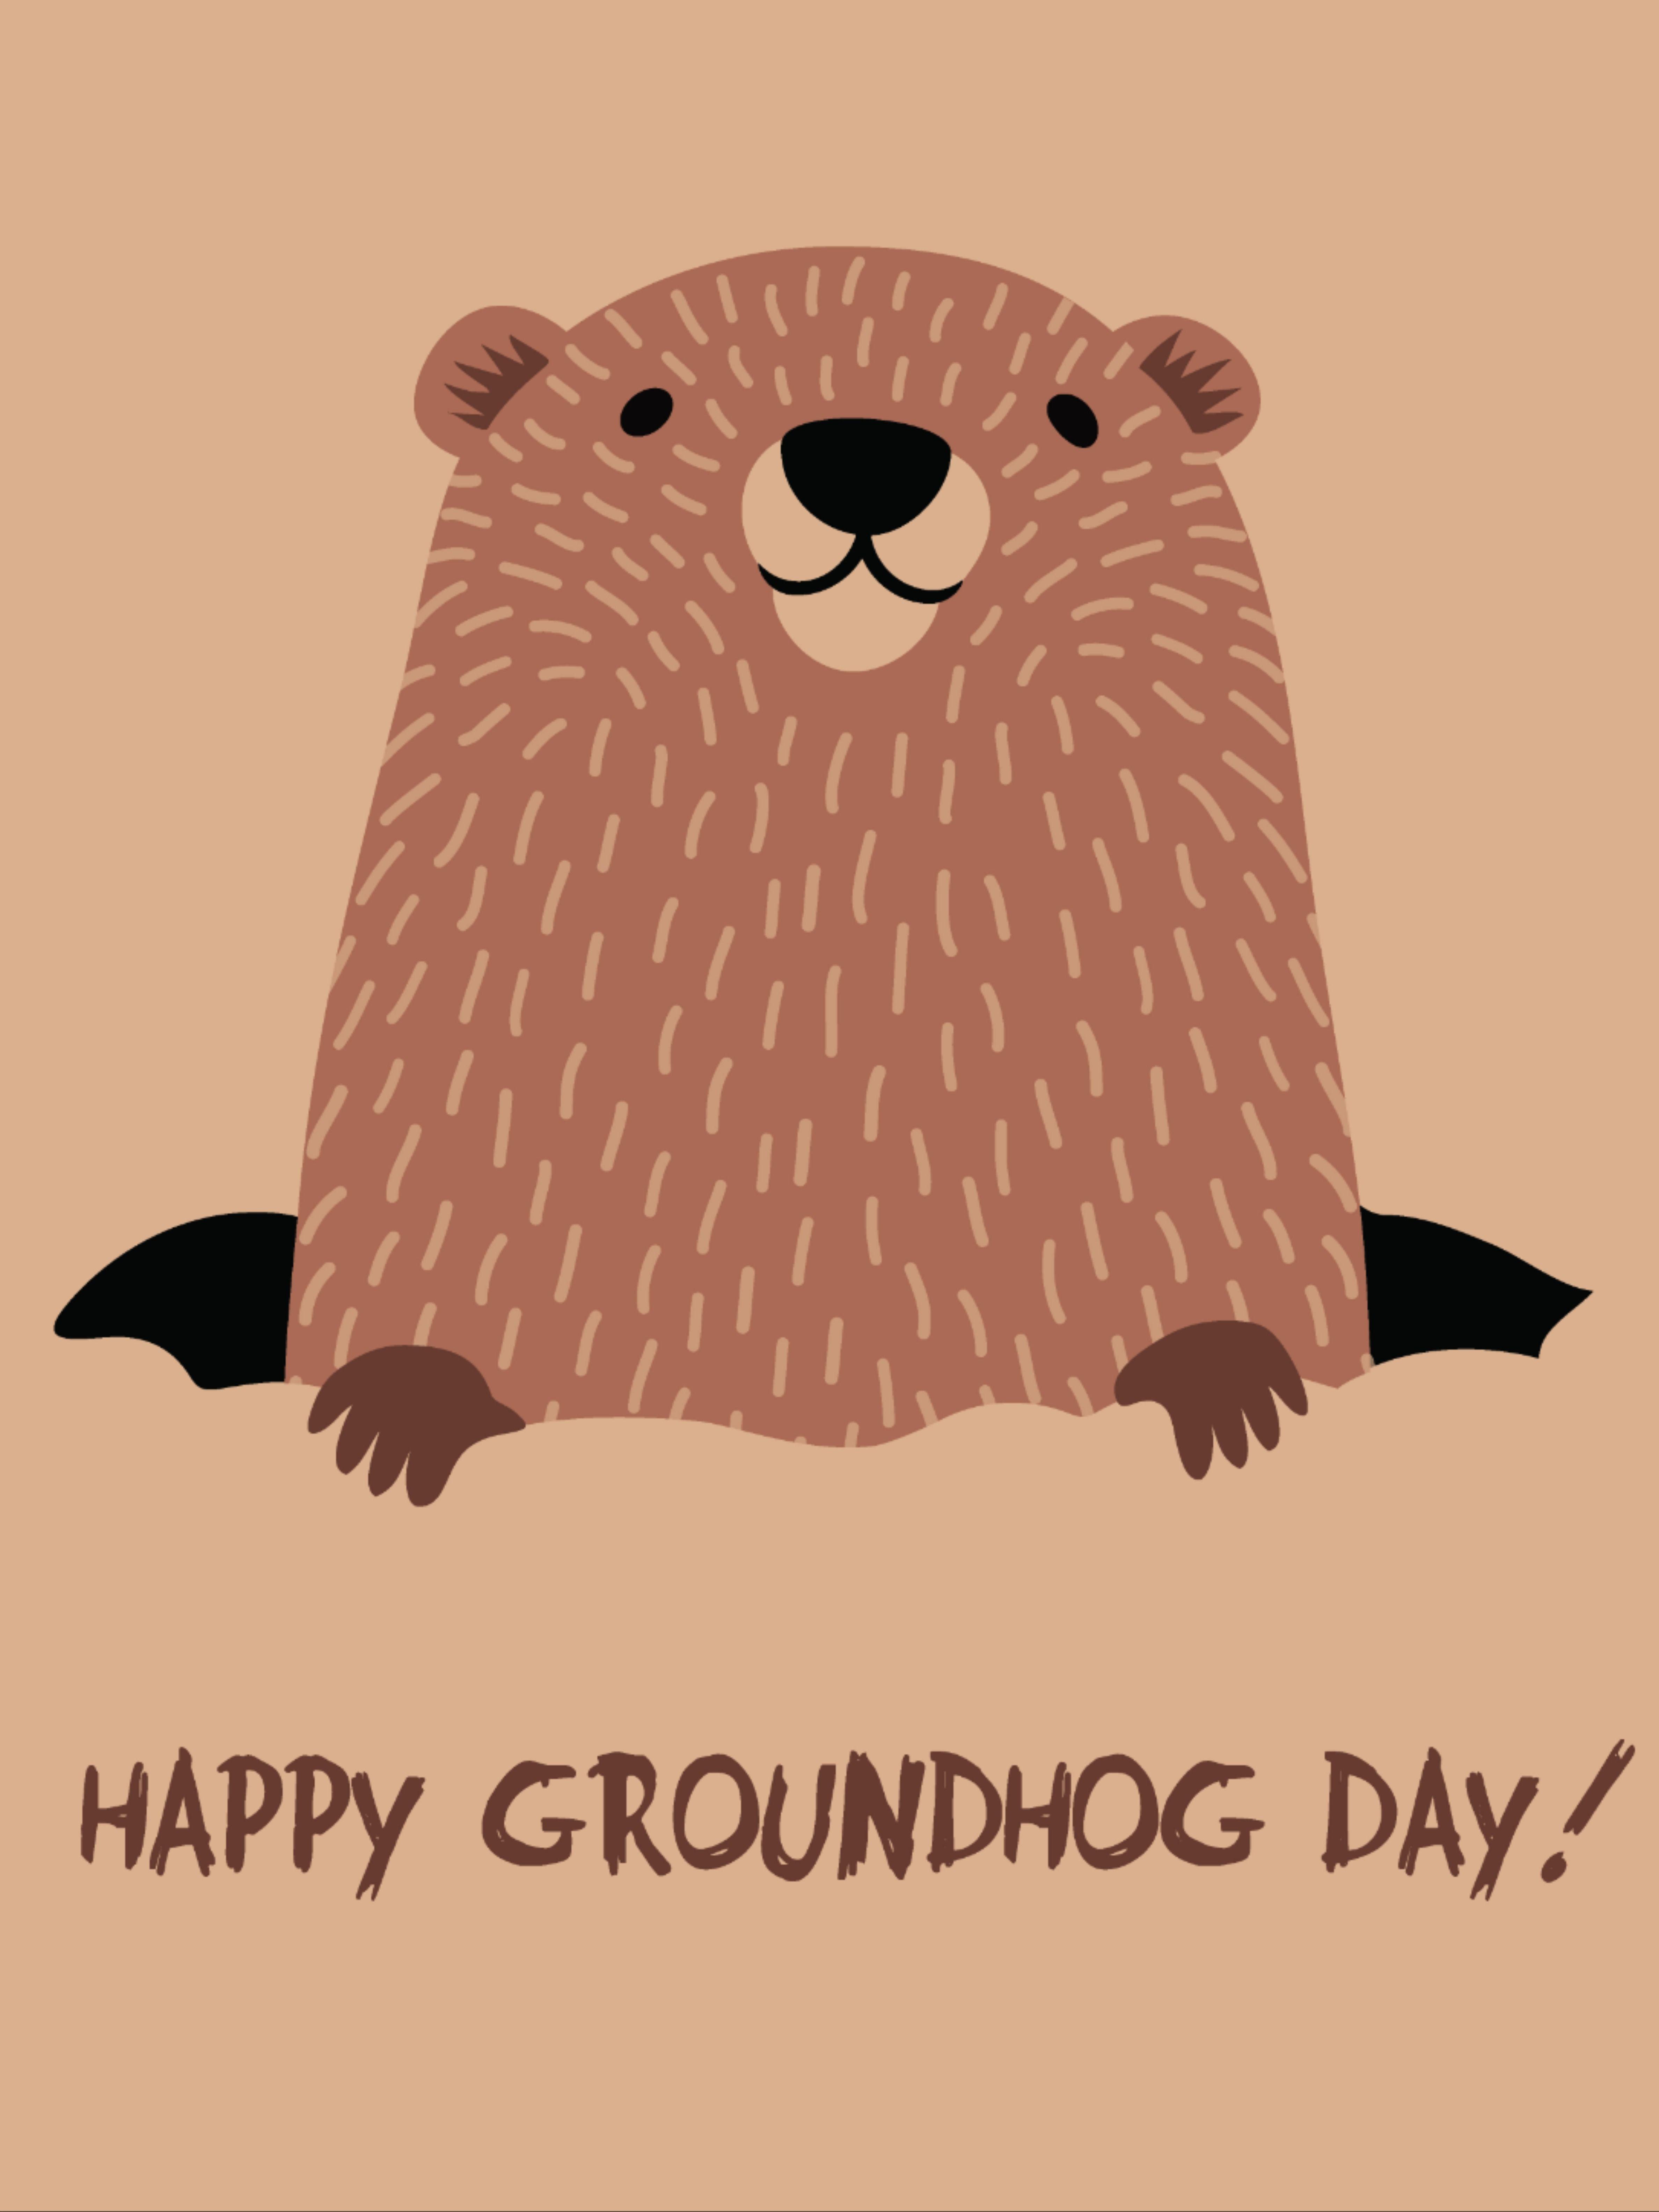 Happy Groundhog Day In 2021 Groundhog Day Happy Groundhog Day Groundhog